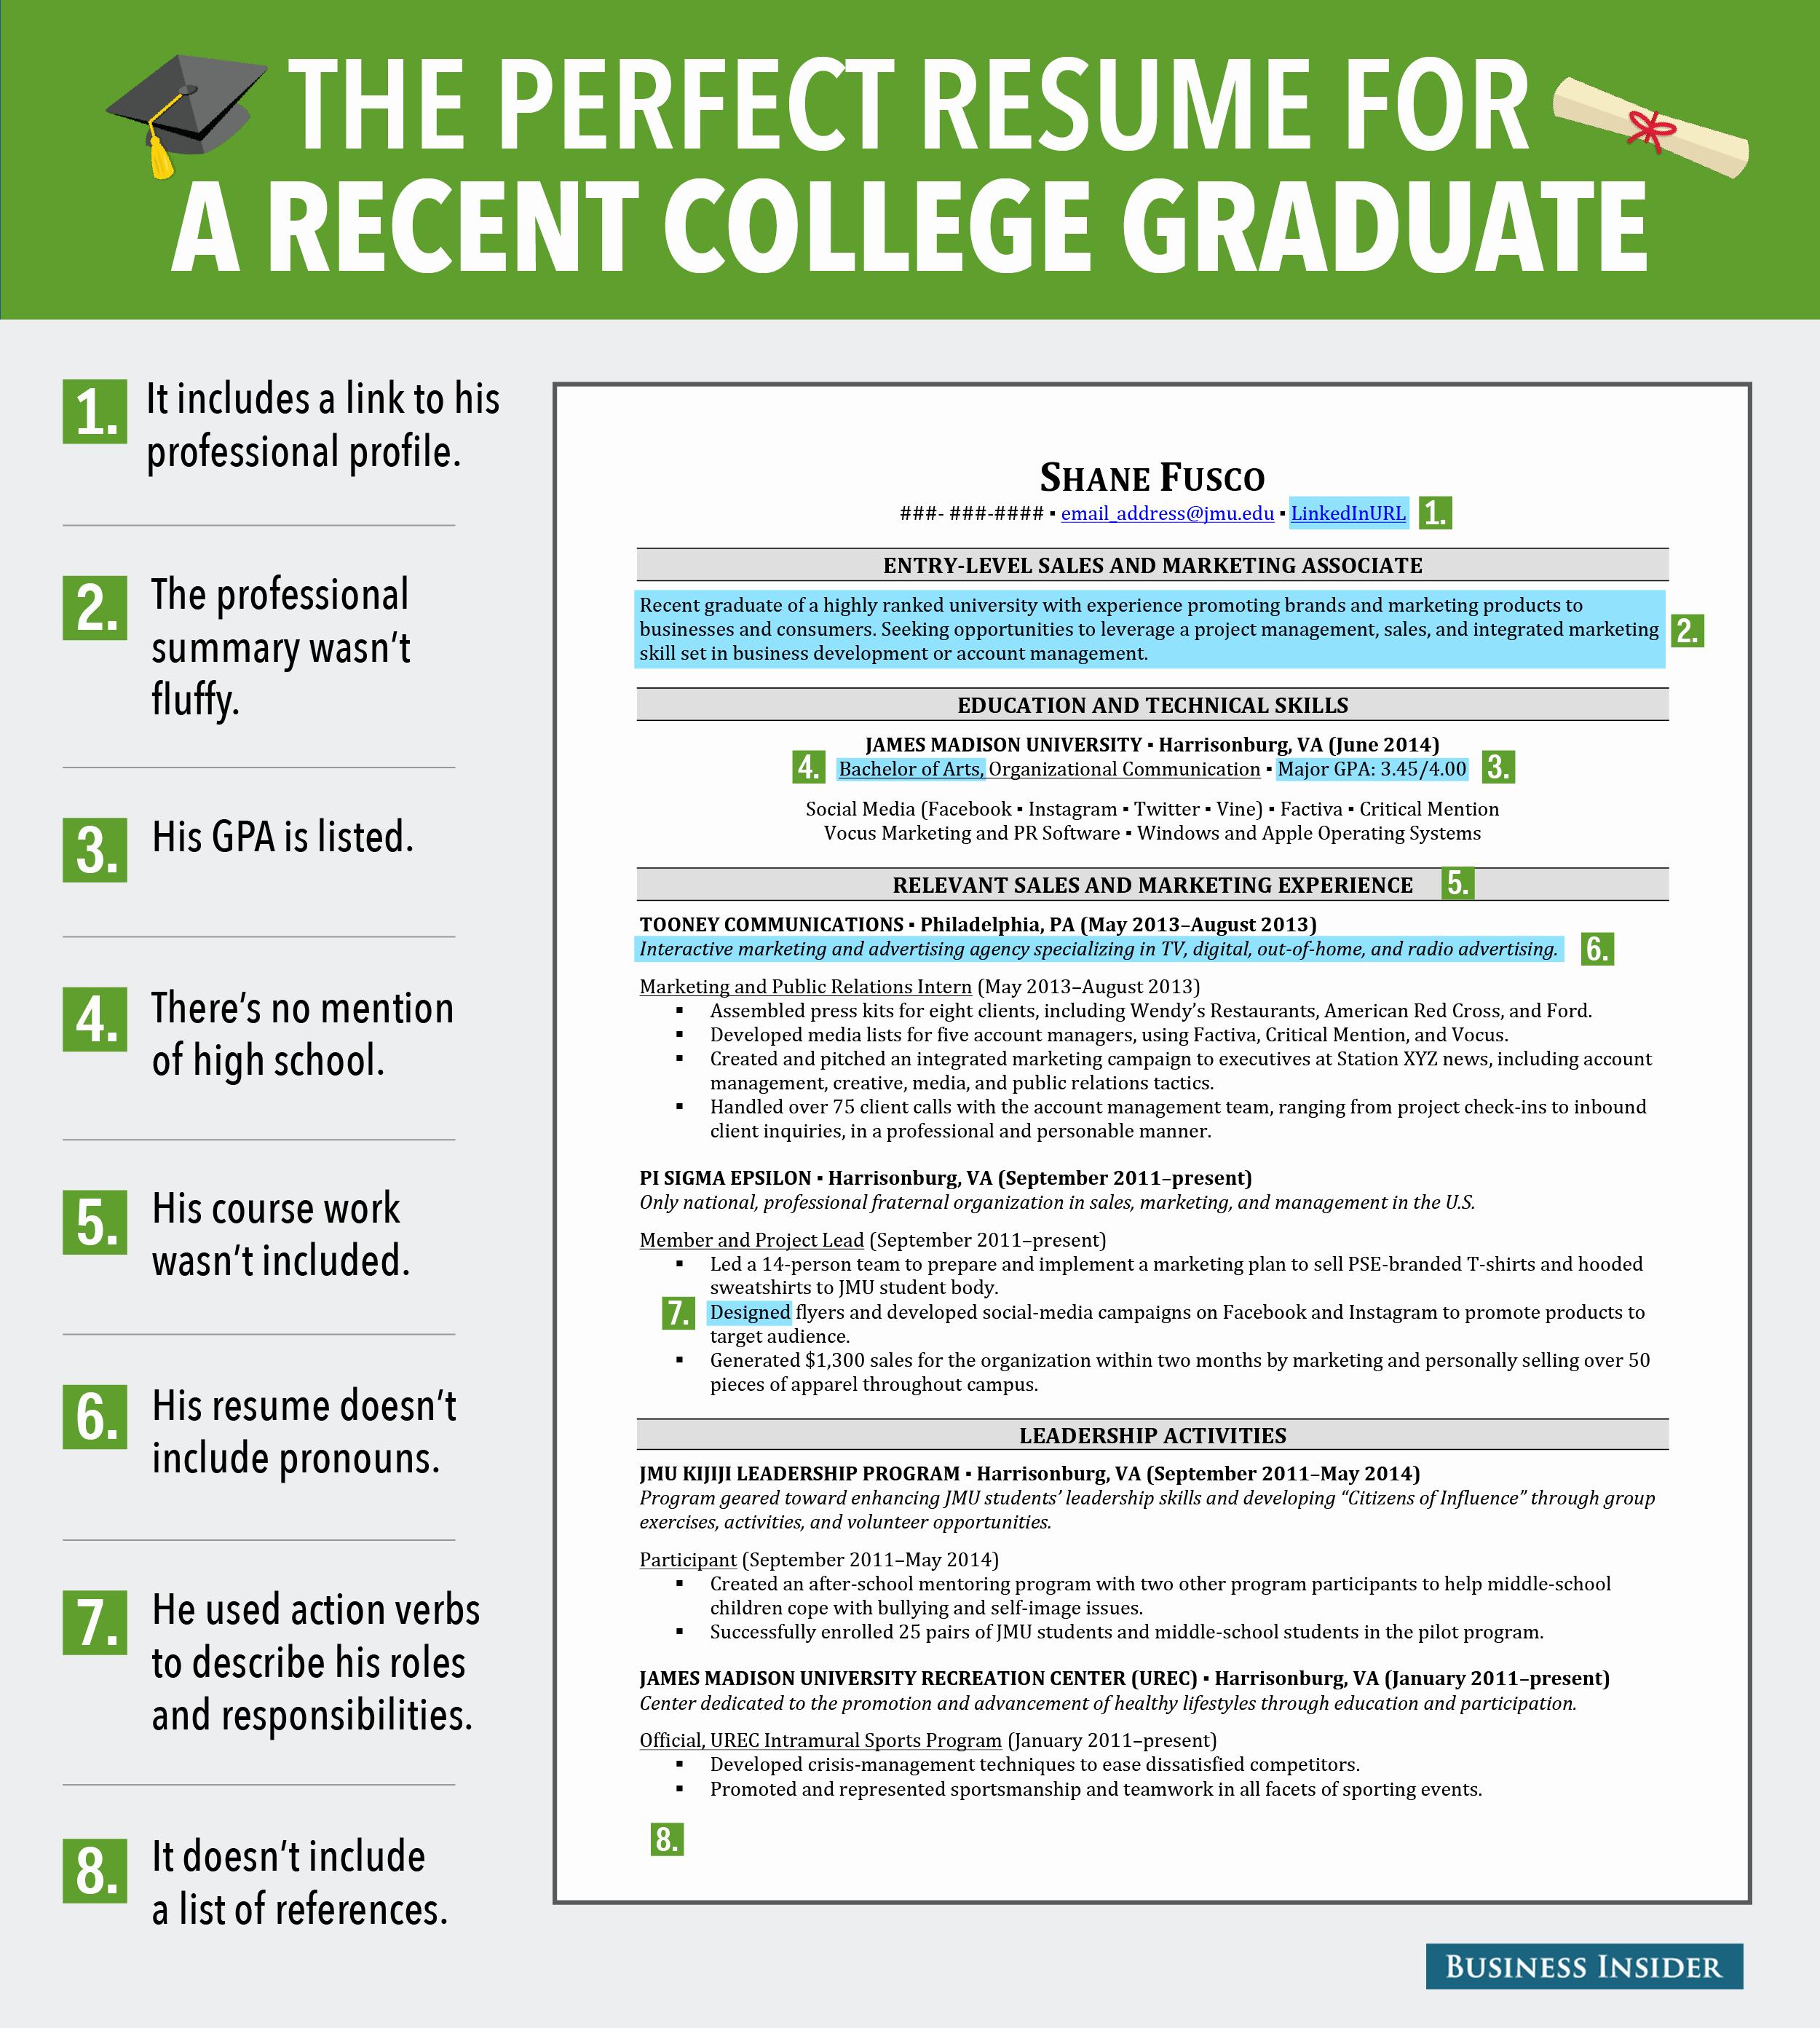 Sample Resume for College Graduate Best Of Excellent Resume for Recent Grad Business Insider